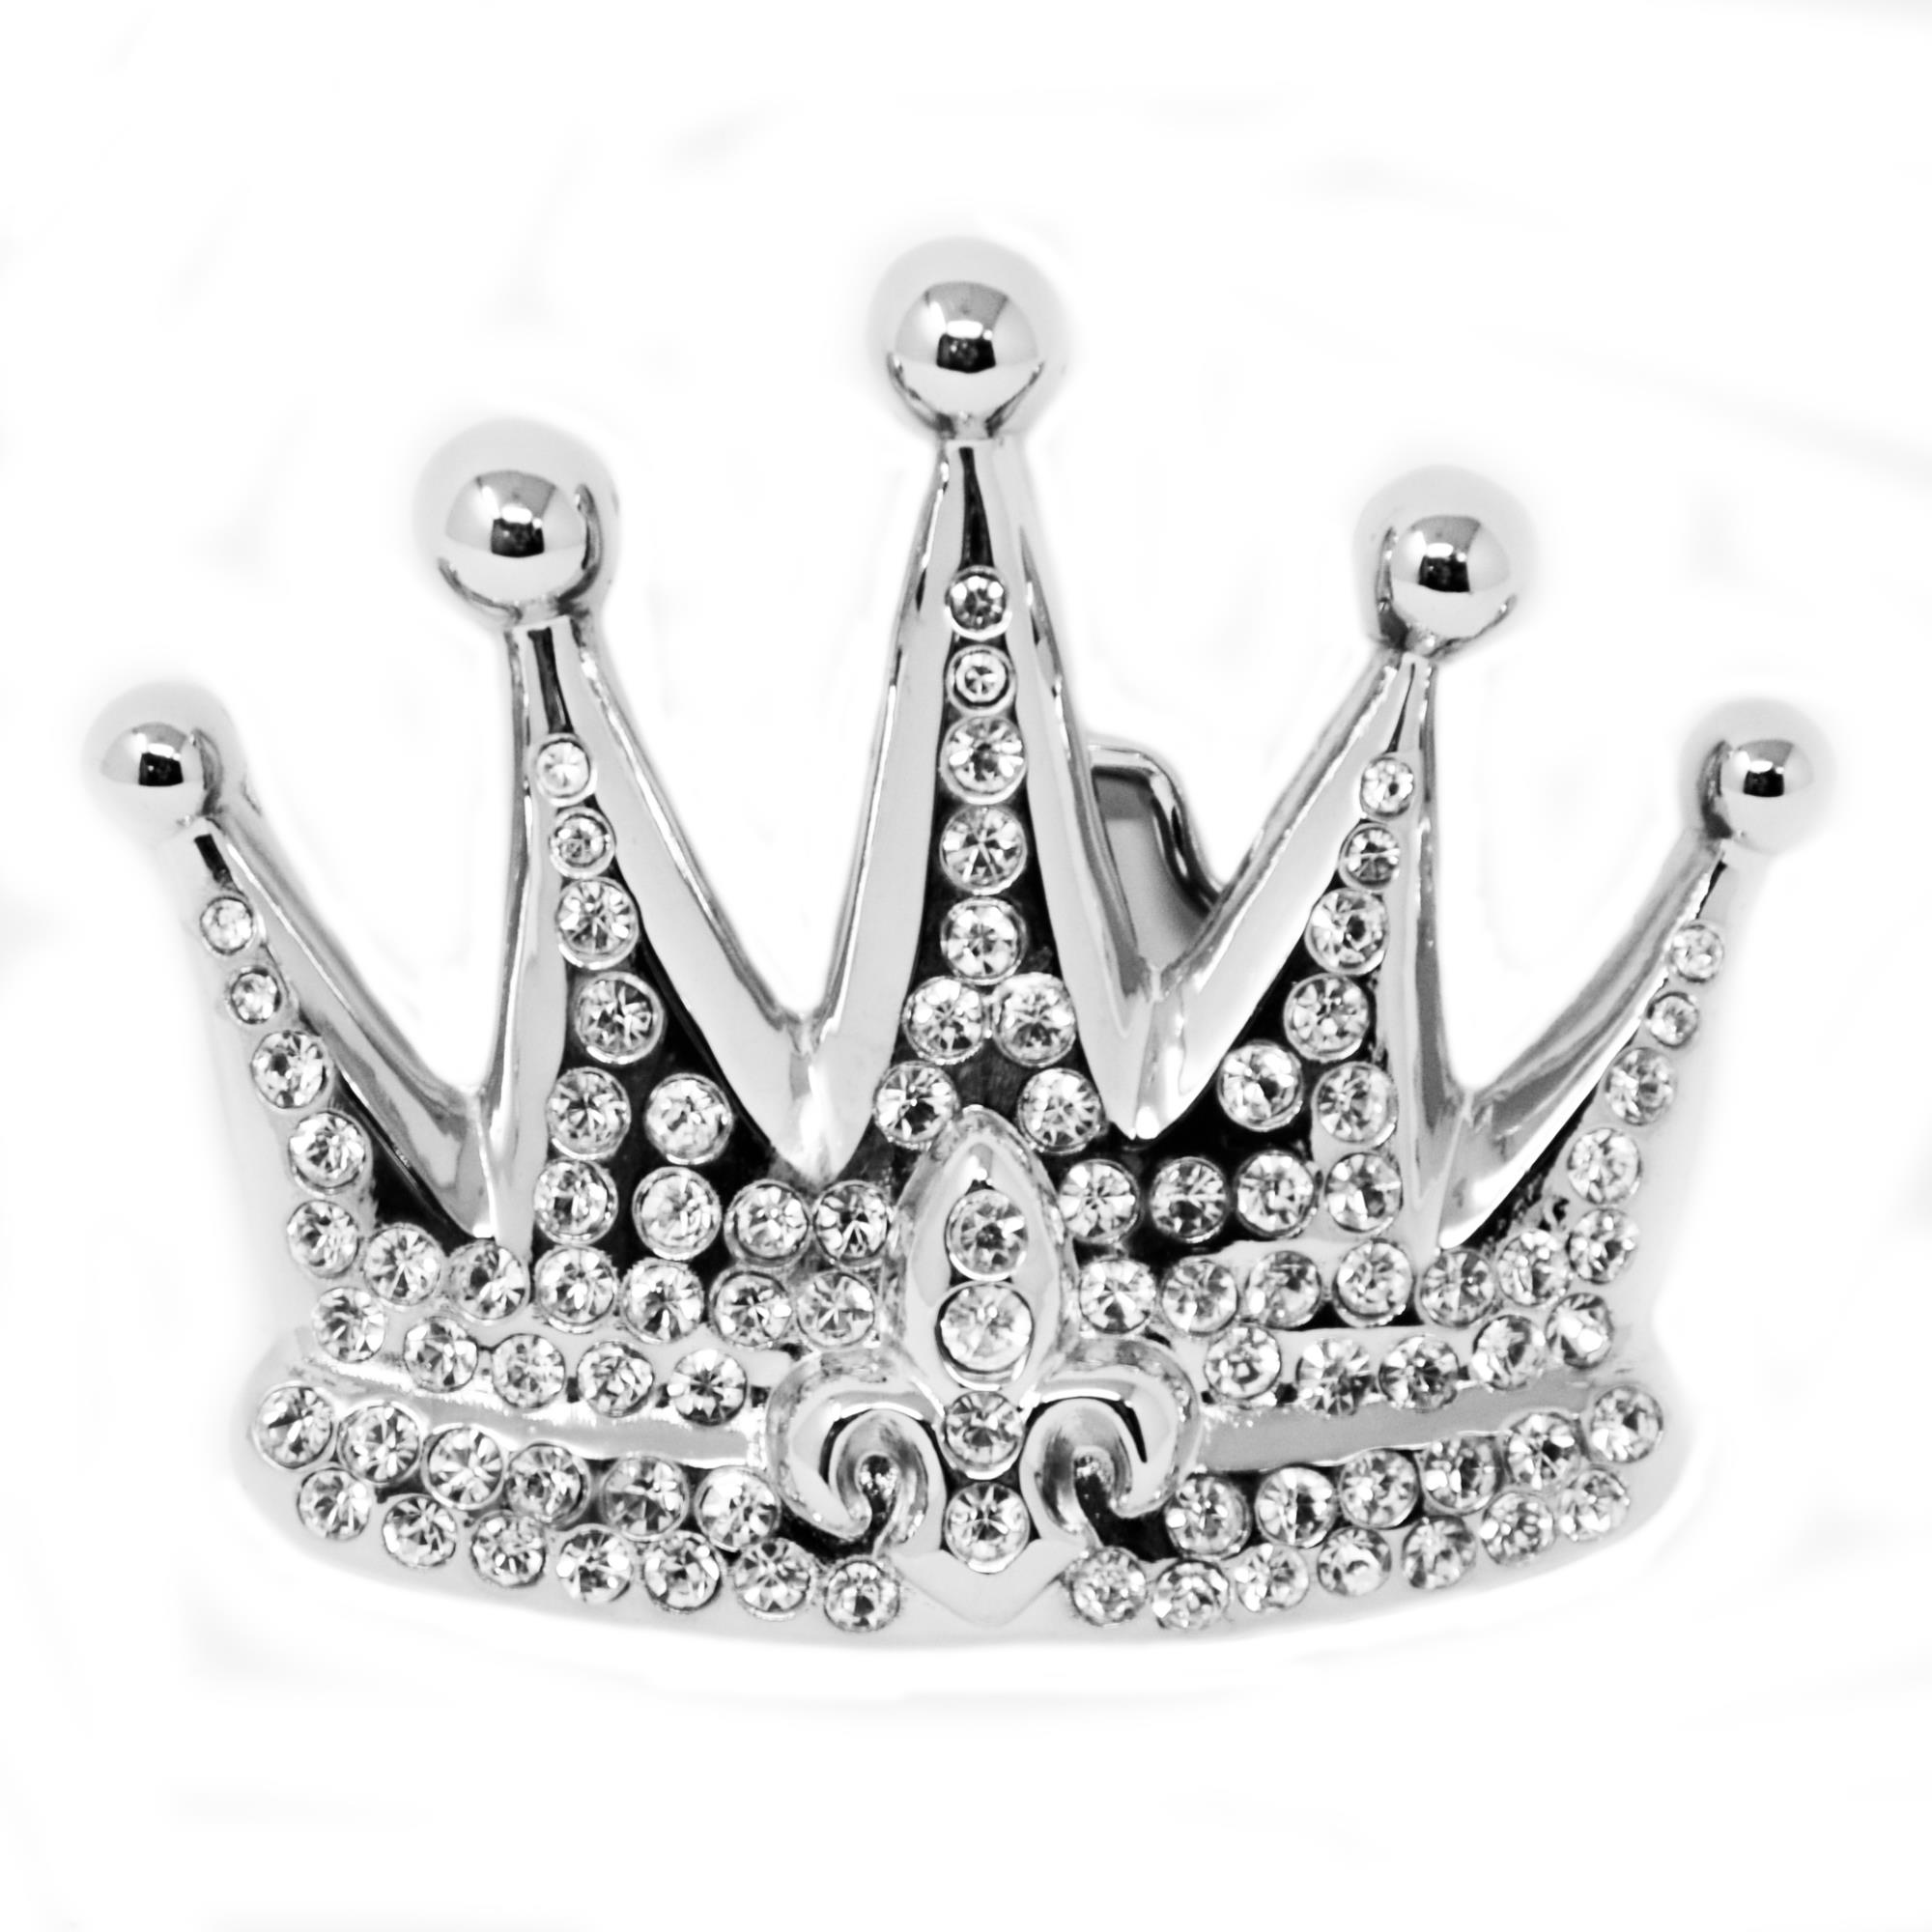 Diamond Crown Buckle